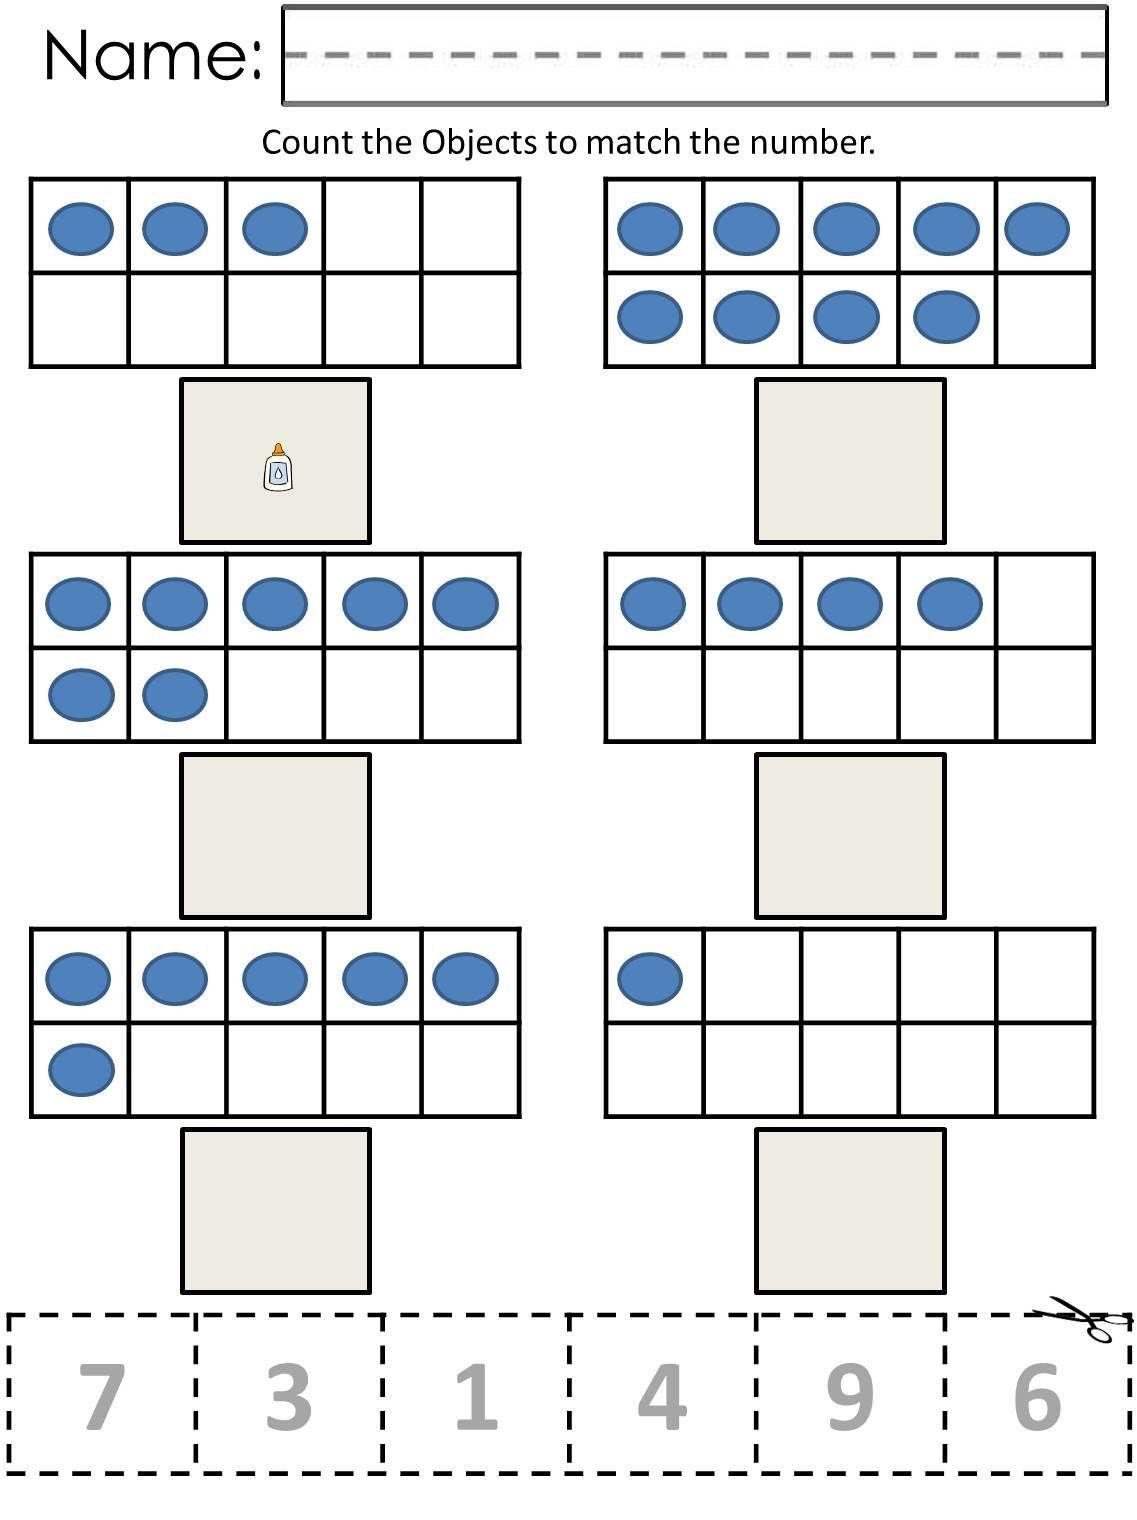 Worksheets For Autistic Kindergarteners Math Worksheets Autistic Students Printable Math Worksheets [ 1520 x 1137 Pixel ]